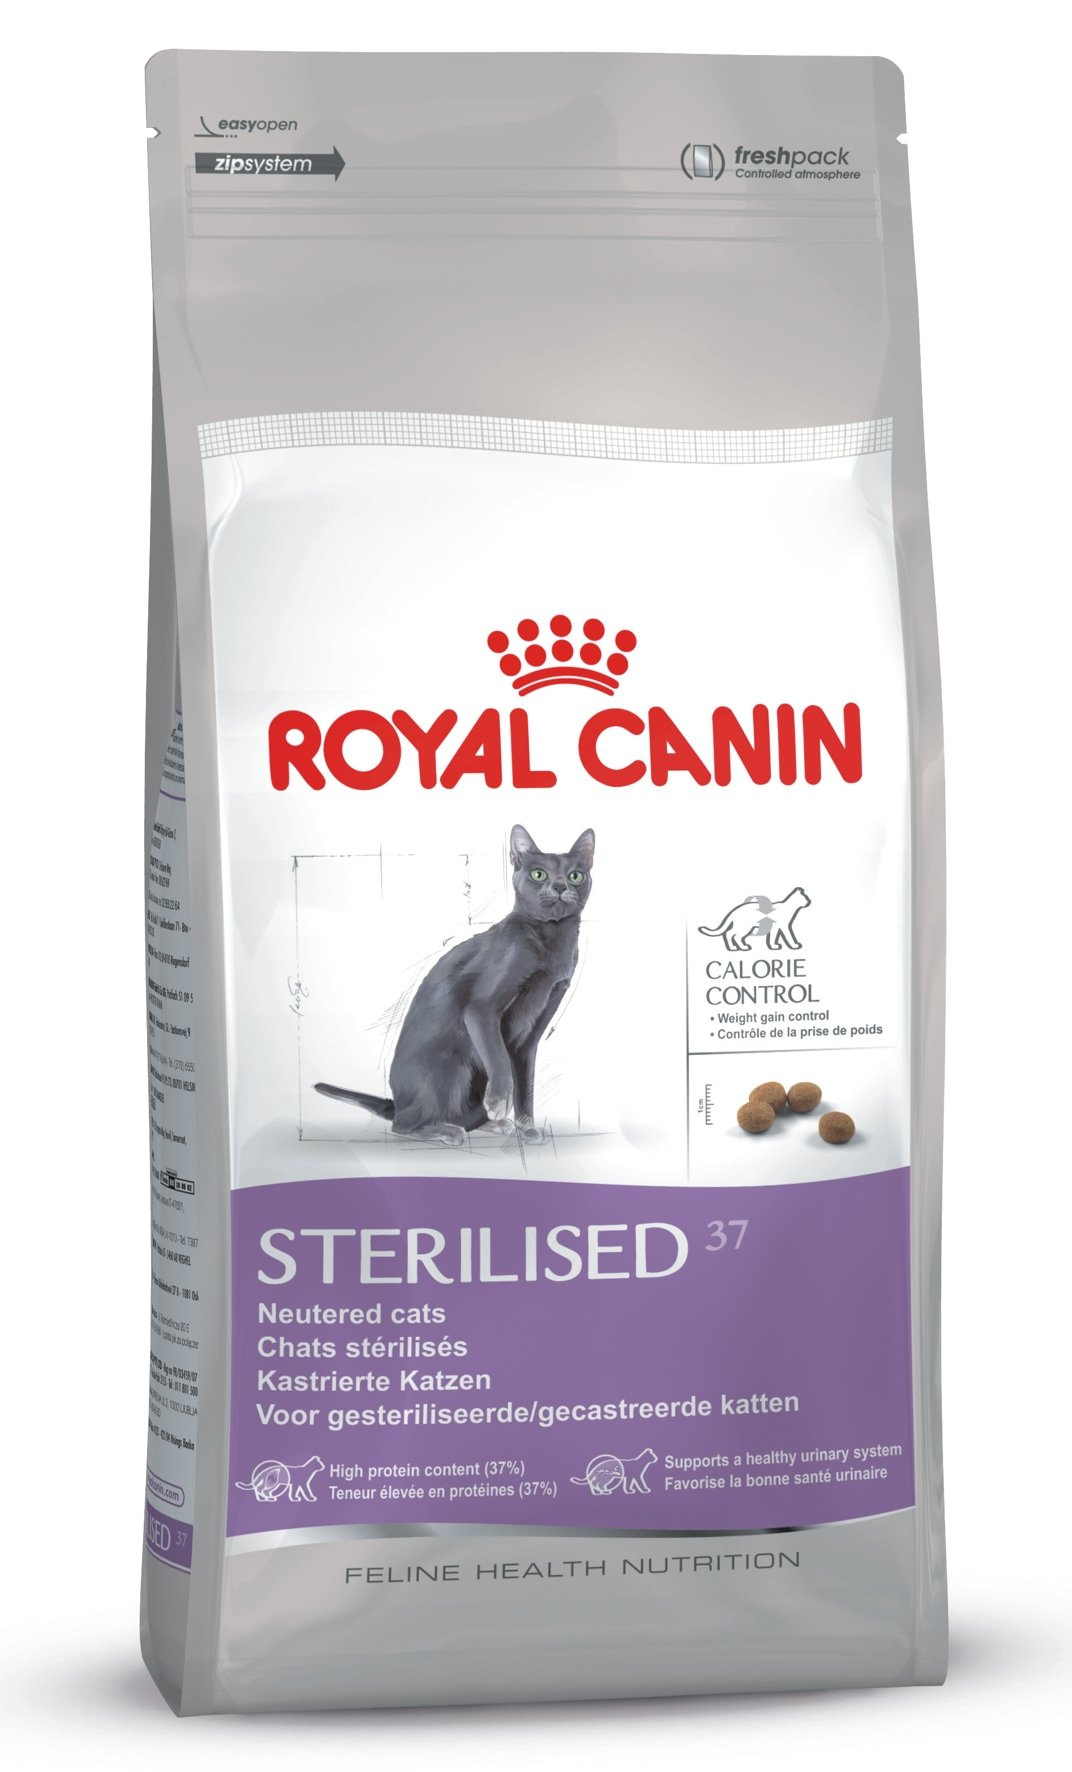 Royal Canin 55128 esterilizado 10 kg - comida para gatos product image